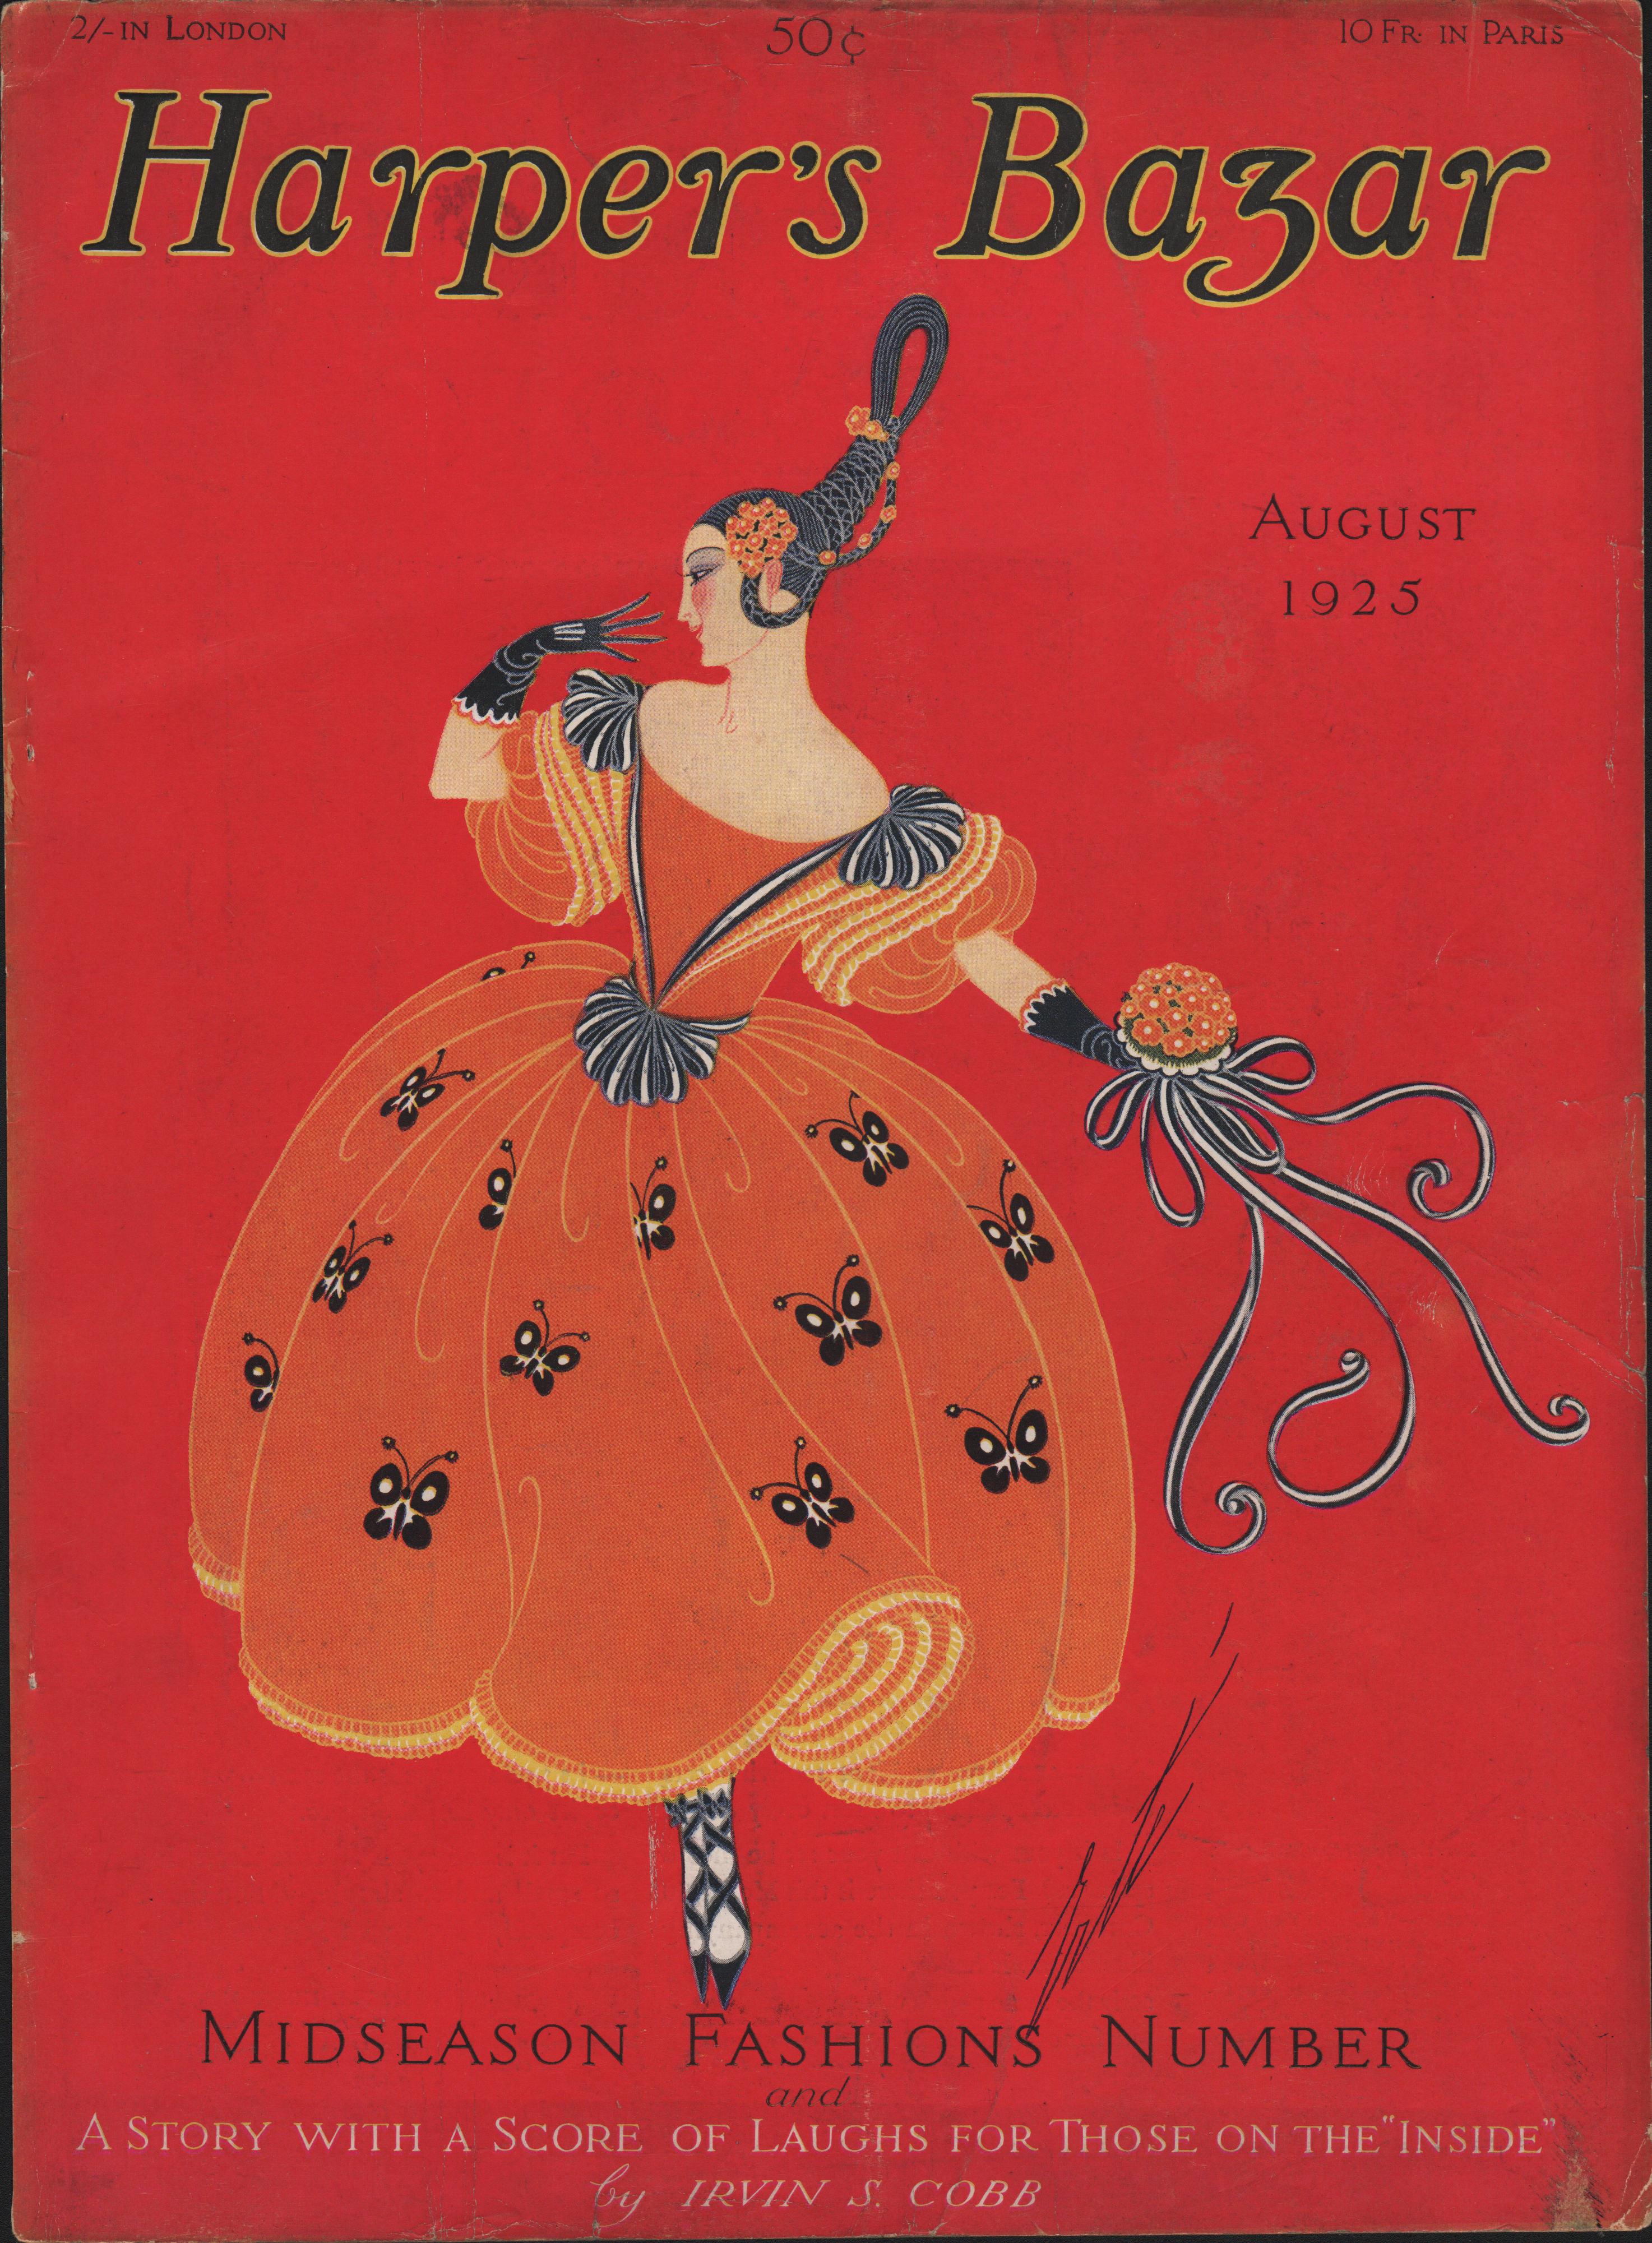 Harpers Bazar Bazaar Magazine Cover August 1925